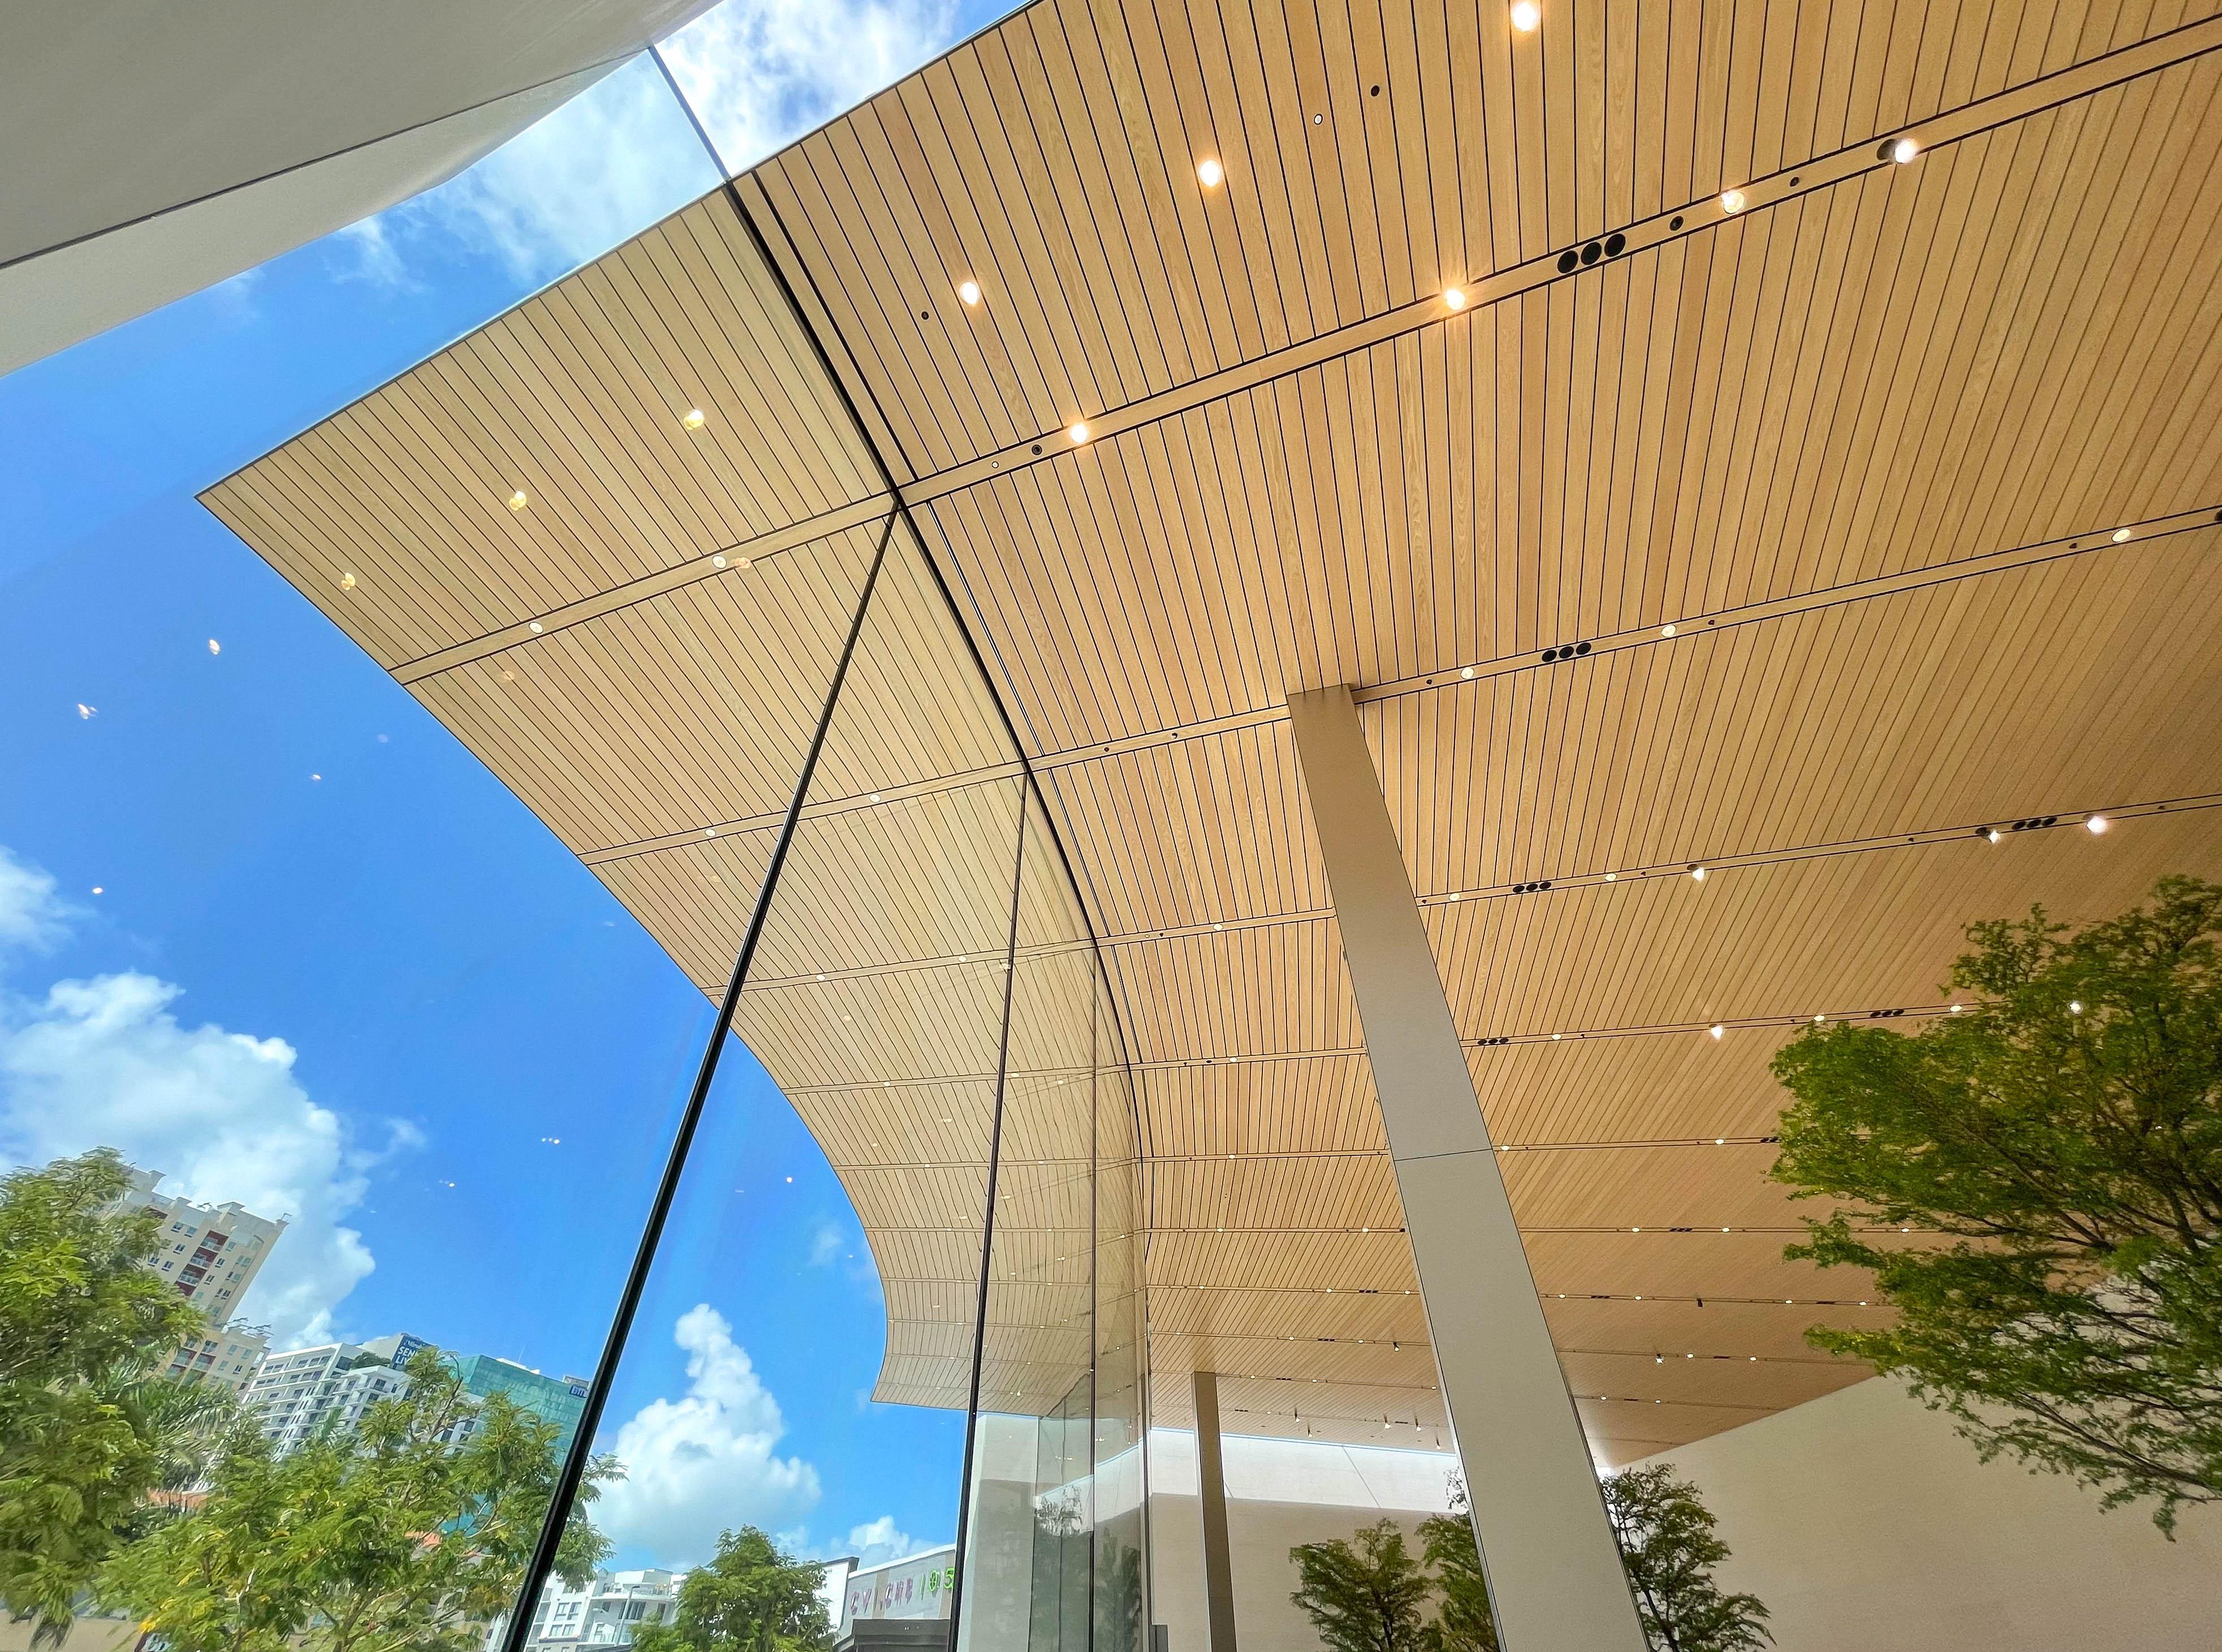 The skylight at Apple Dadeland.